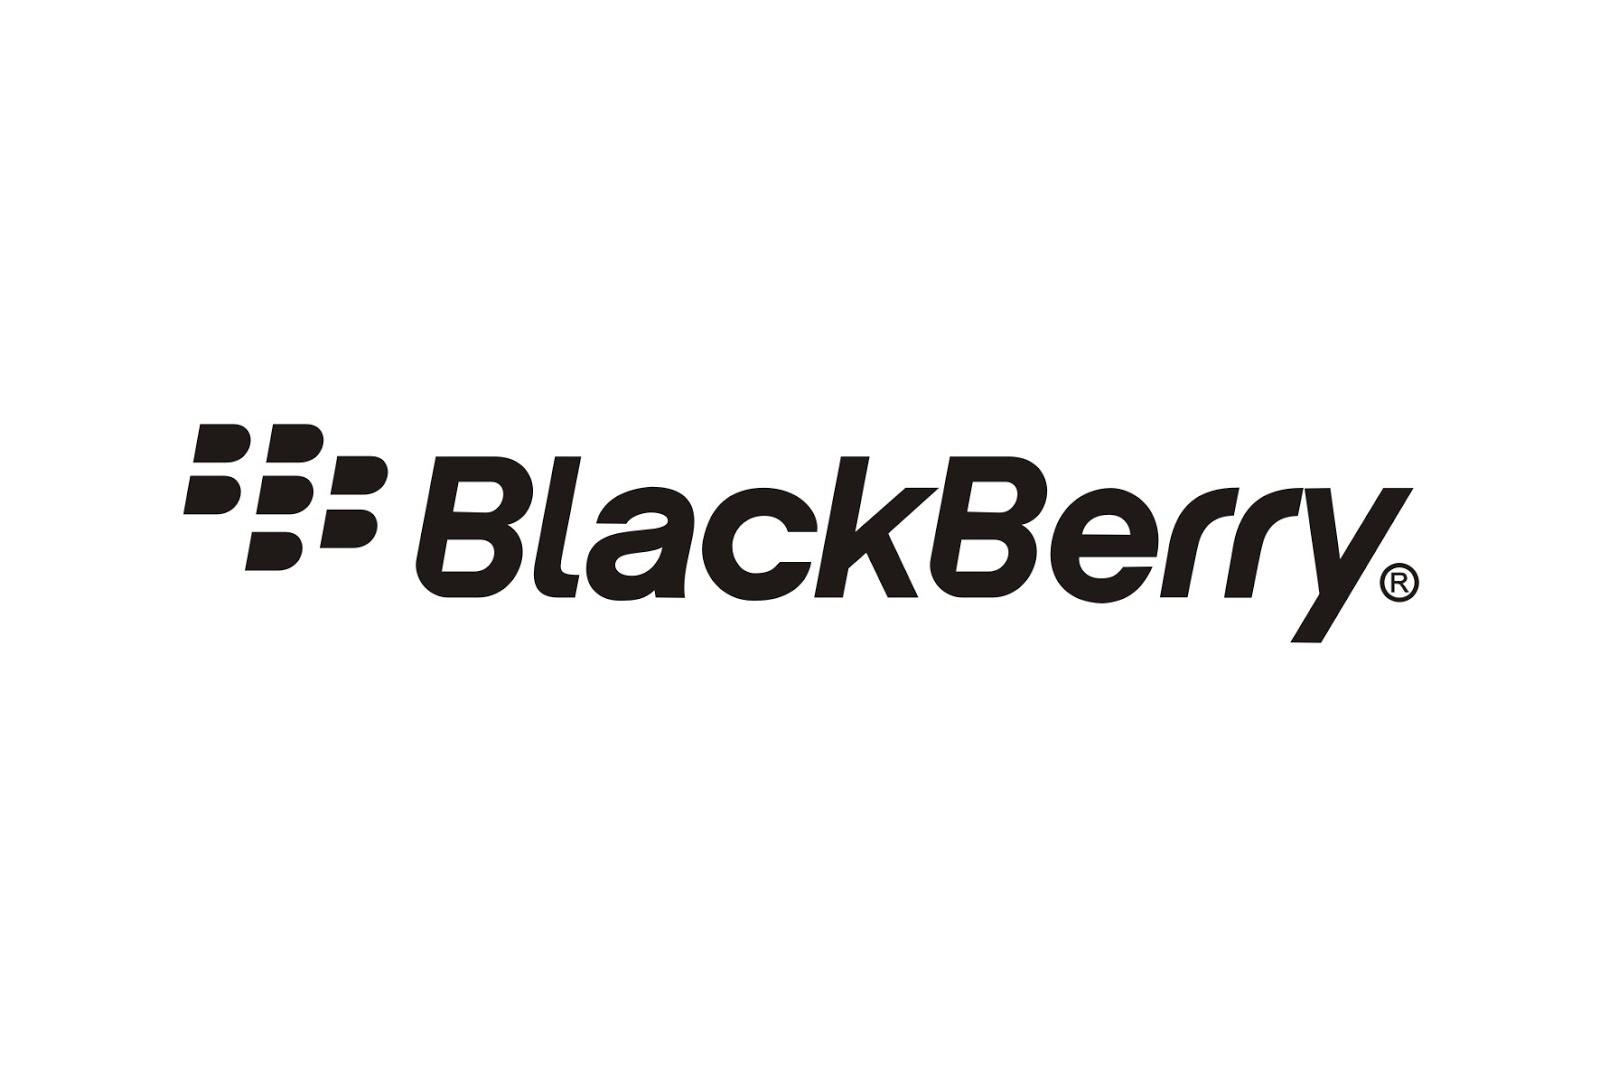 BlackBerry - 4 Brand Handphone Yang Pernah Berjaya Di Era Telepon Seluler